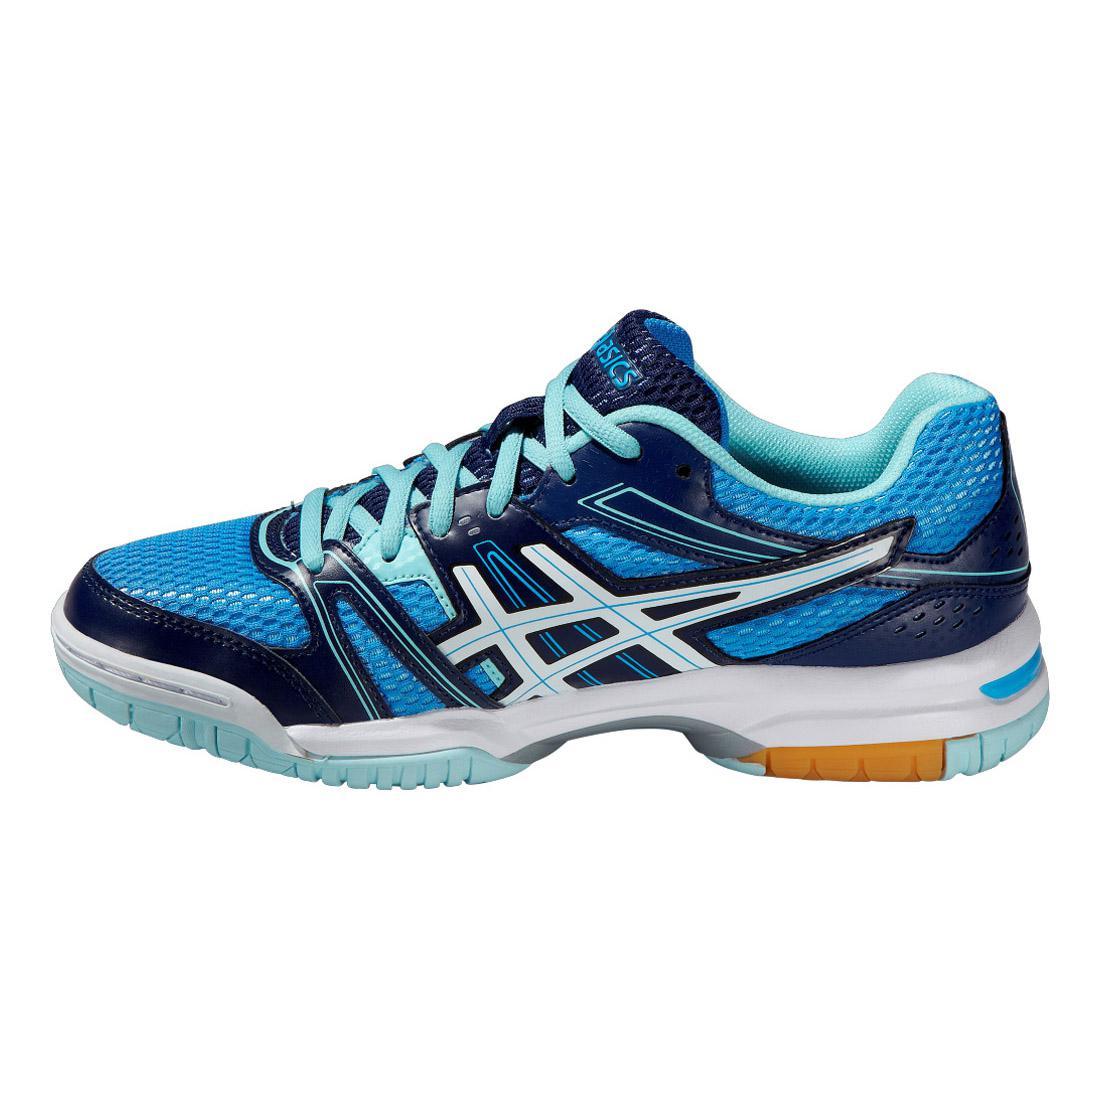 Womens Tennis Court Shoes Asics